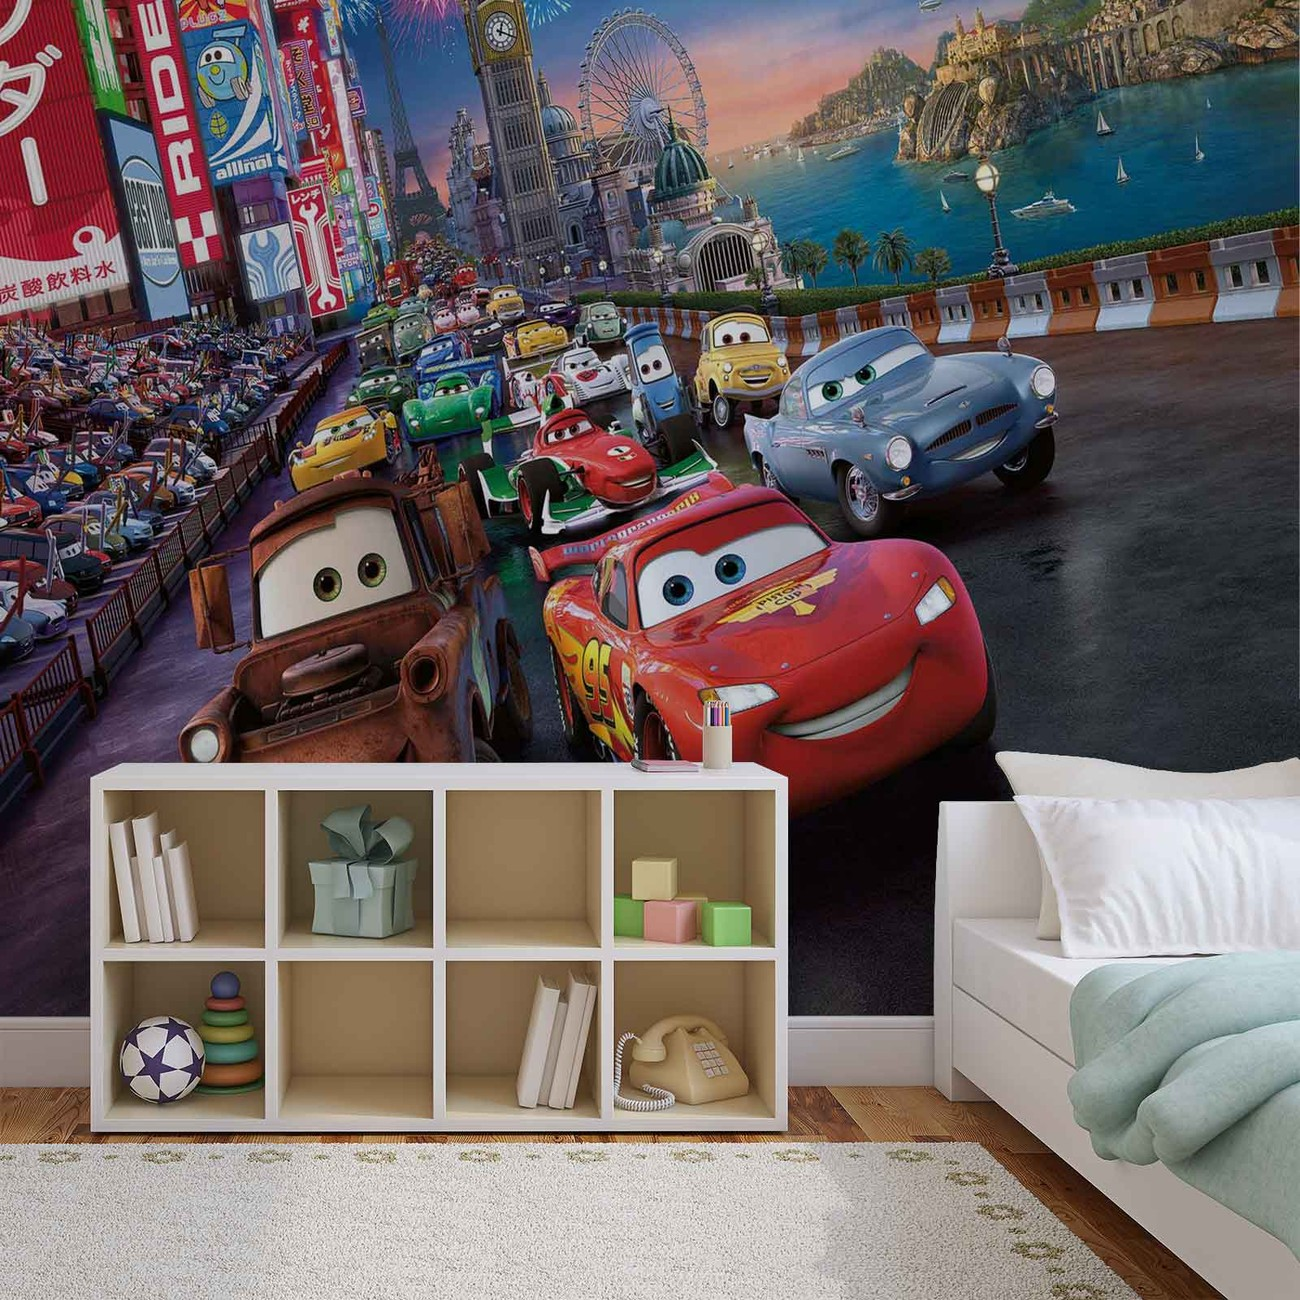 Disney cars lightning mcqueen mater wall paper mural buy for Disney cars wall mural uk